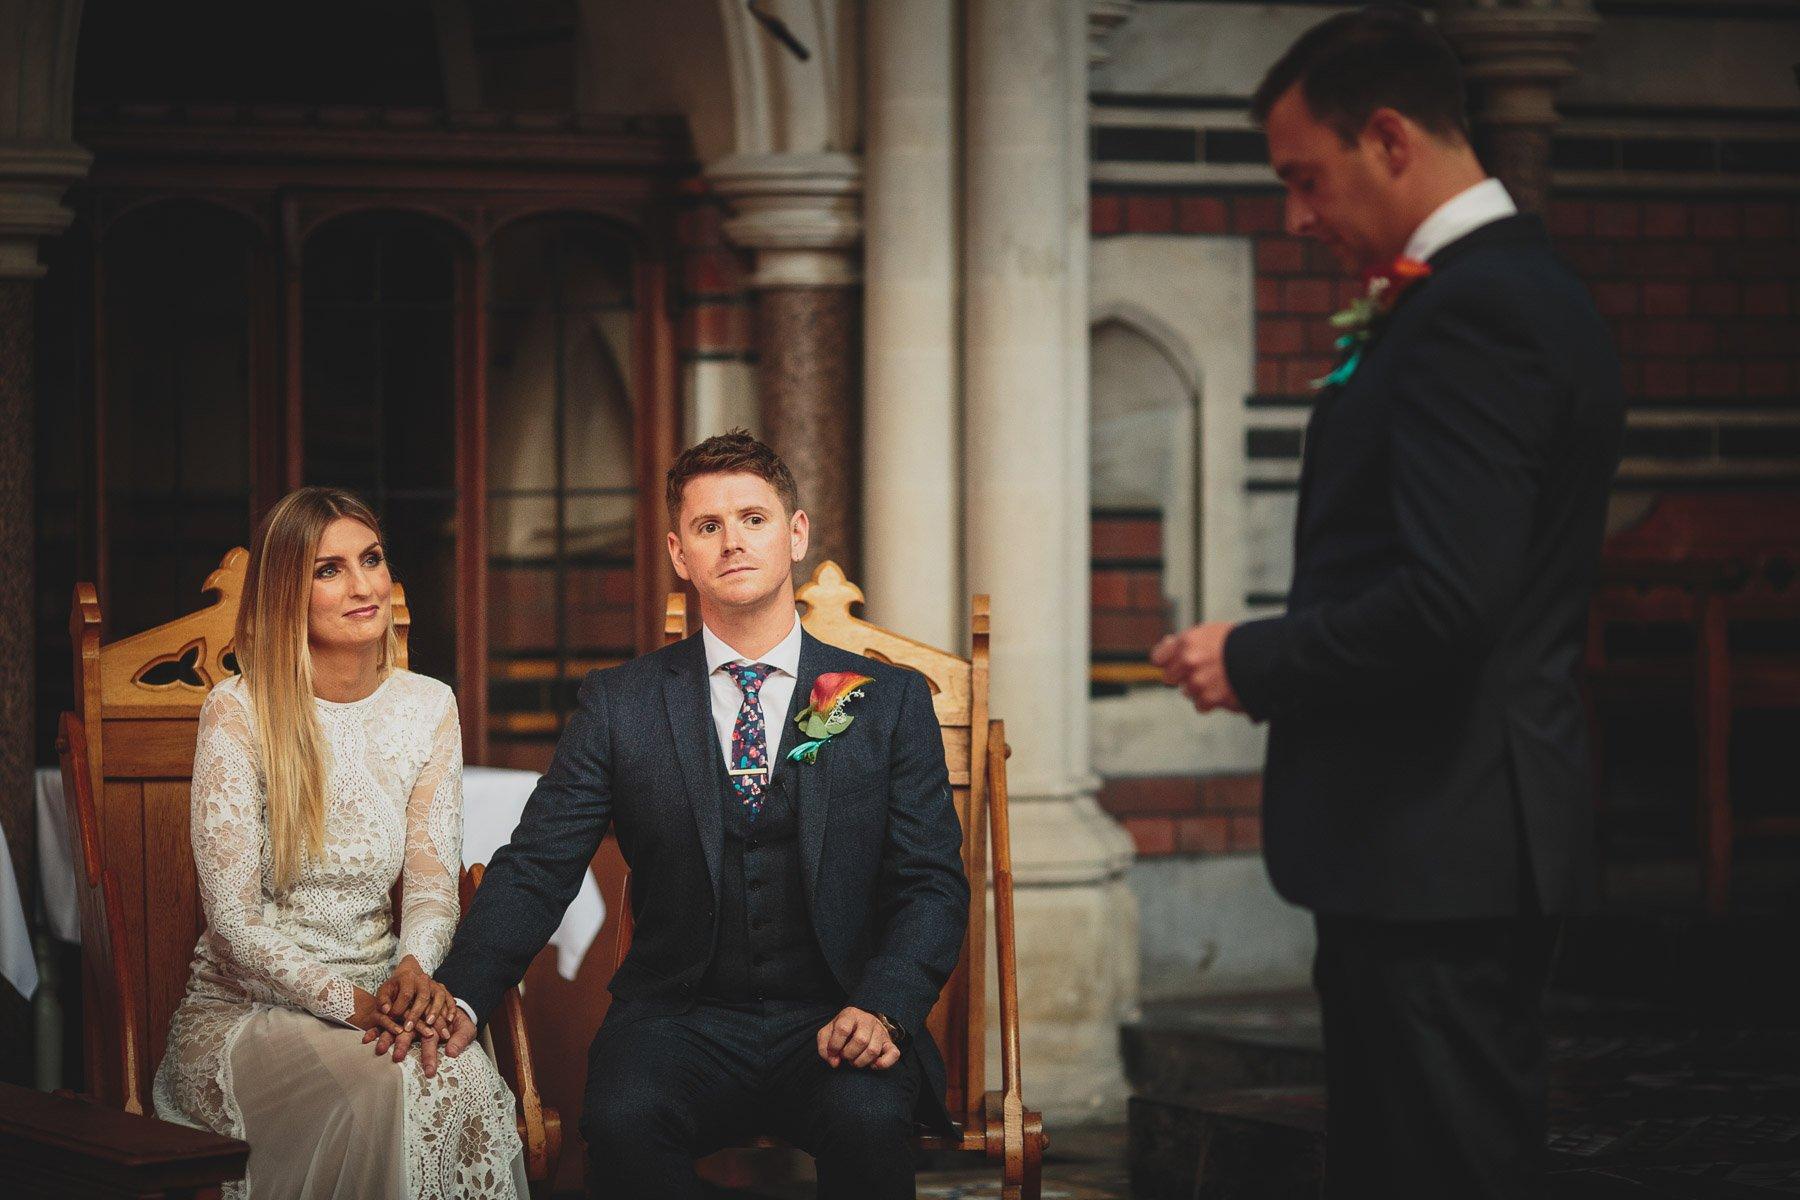 eastbourne-wedding-photography-hannah-tom-026